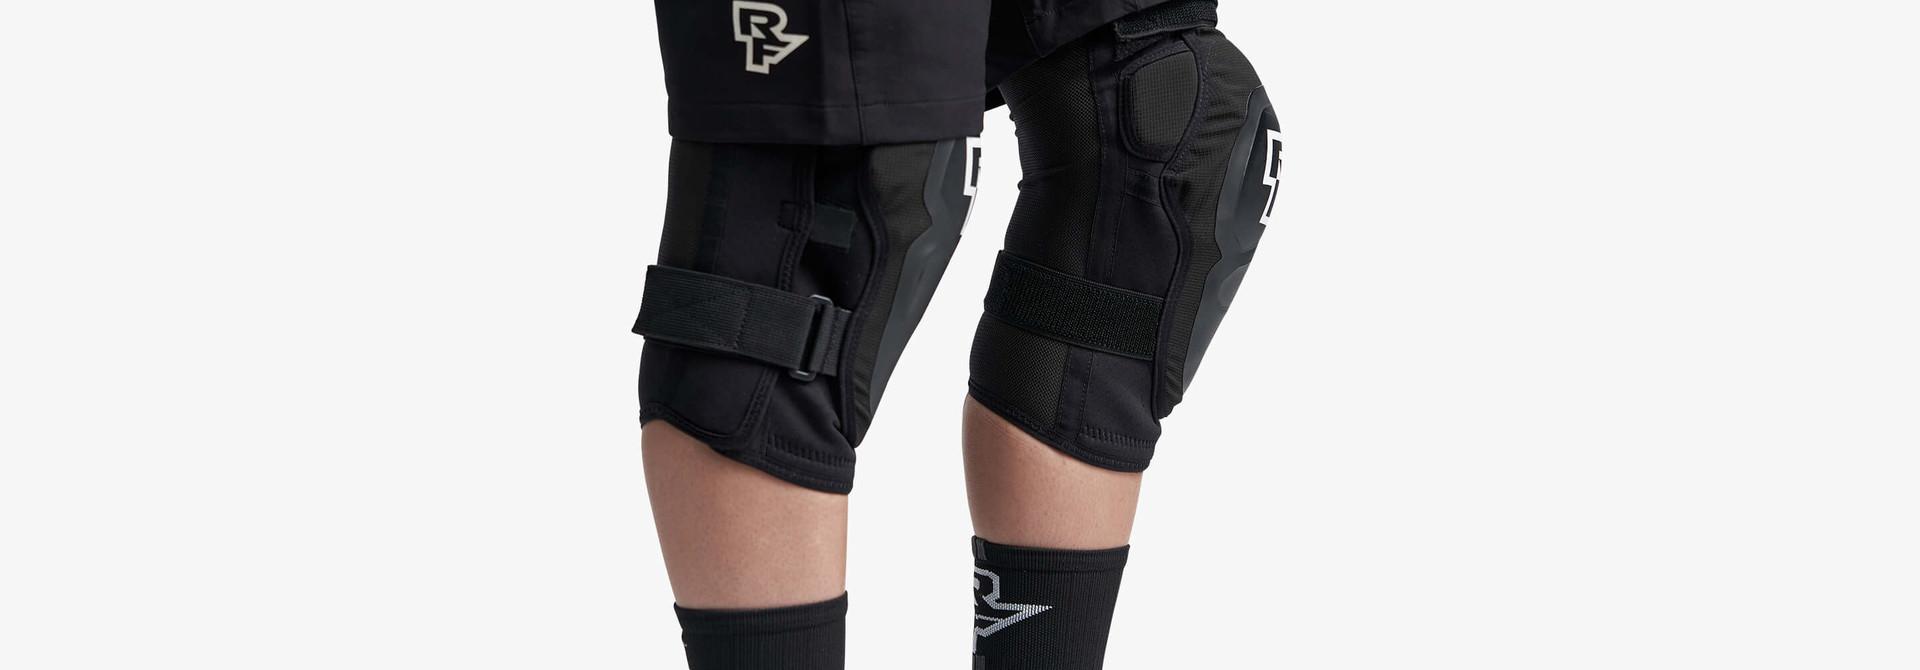 Race Face Roam Knee Pad, Stealth